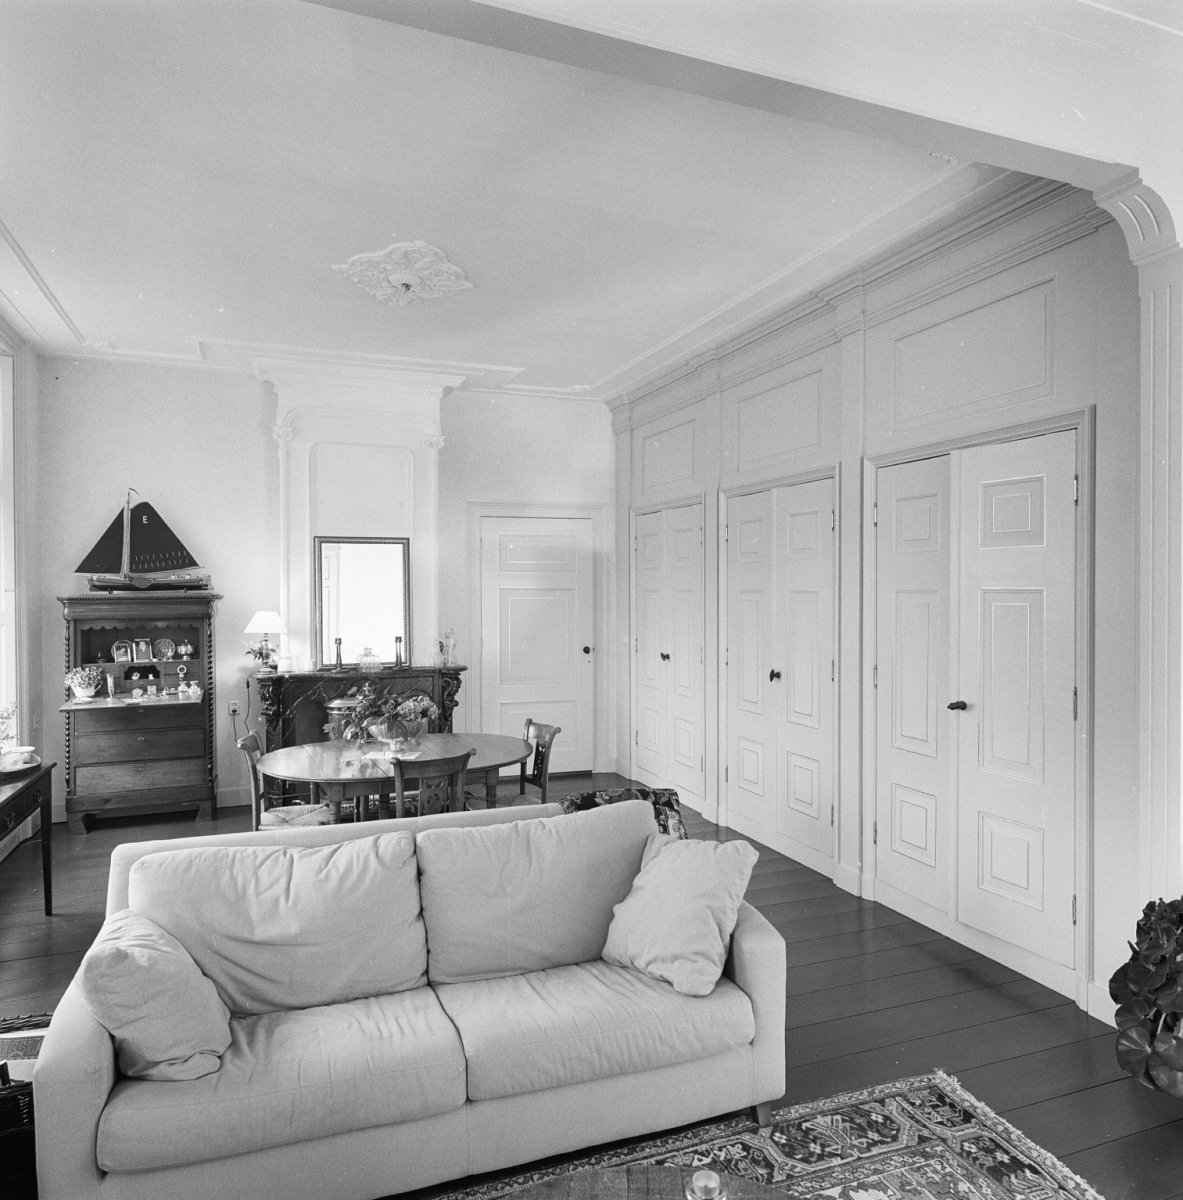 File:Interieur, overzicht woonkamer met kastenwand - 20000301 - RCE ...